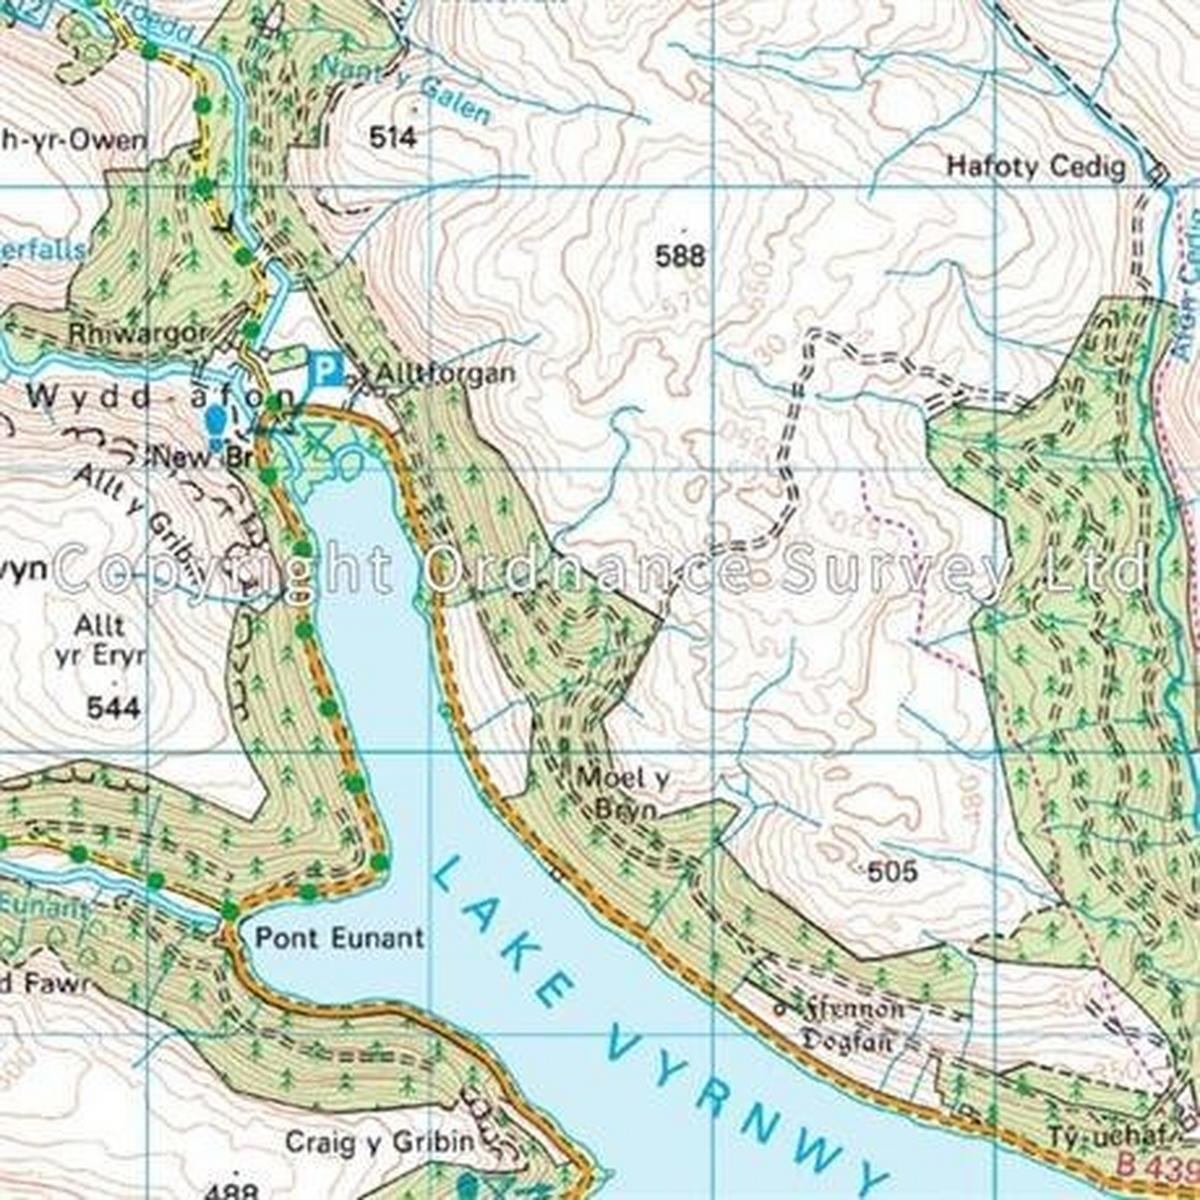 Ordnance Survey OS Landranger ACTIVE Map 125 Bala & Lake Vyrnwy, Berwyn